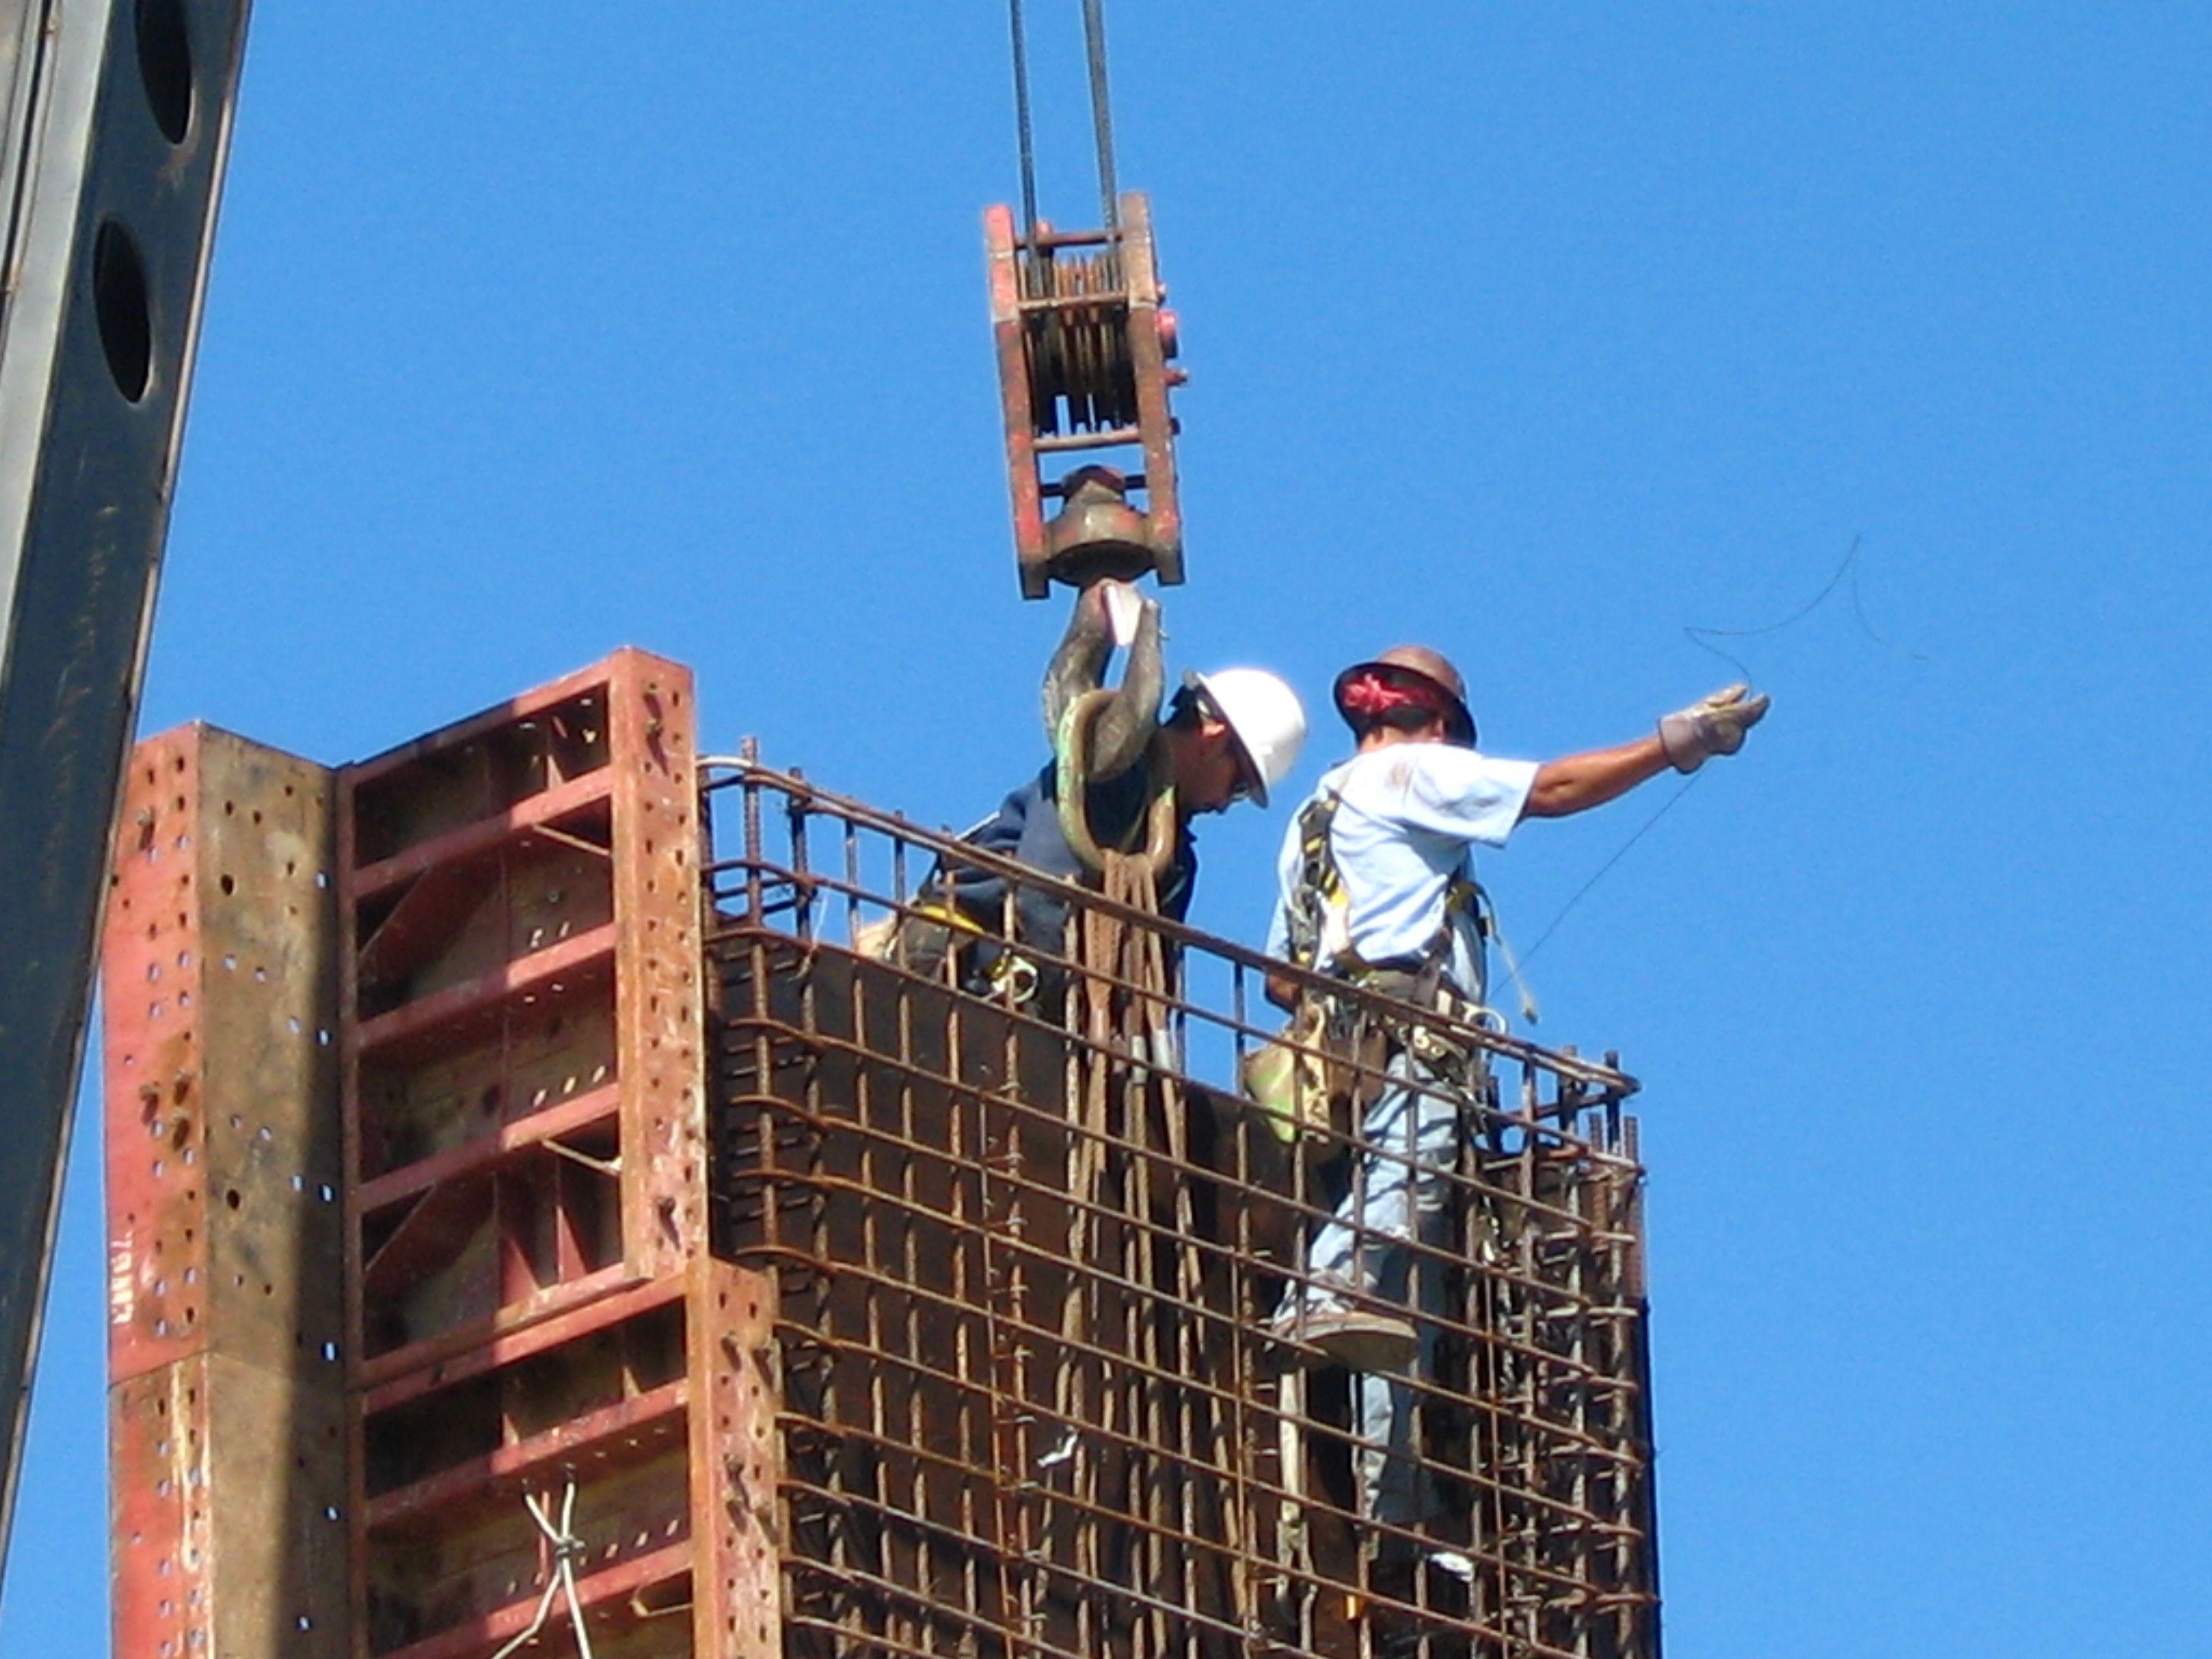 Construction Worker Houston Texas 1 | Flickr - Photo Sharing!